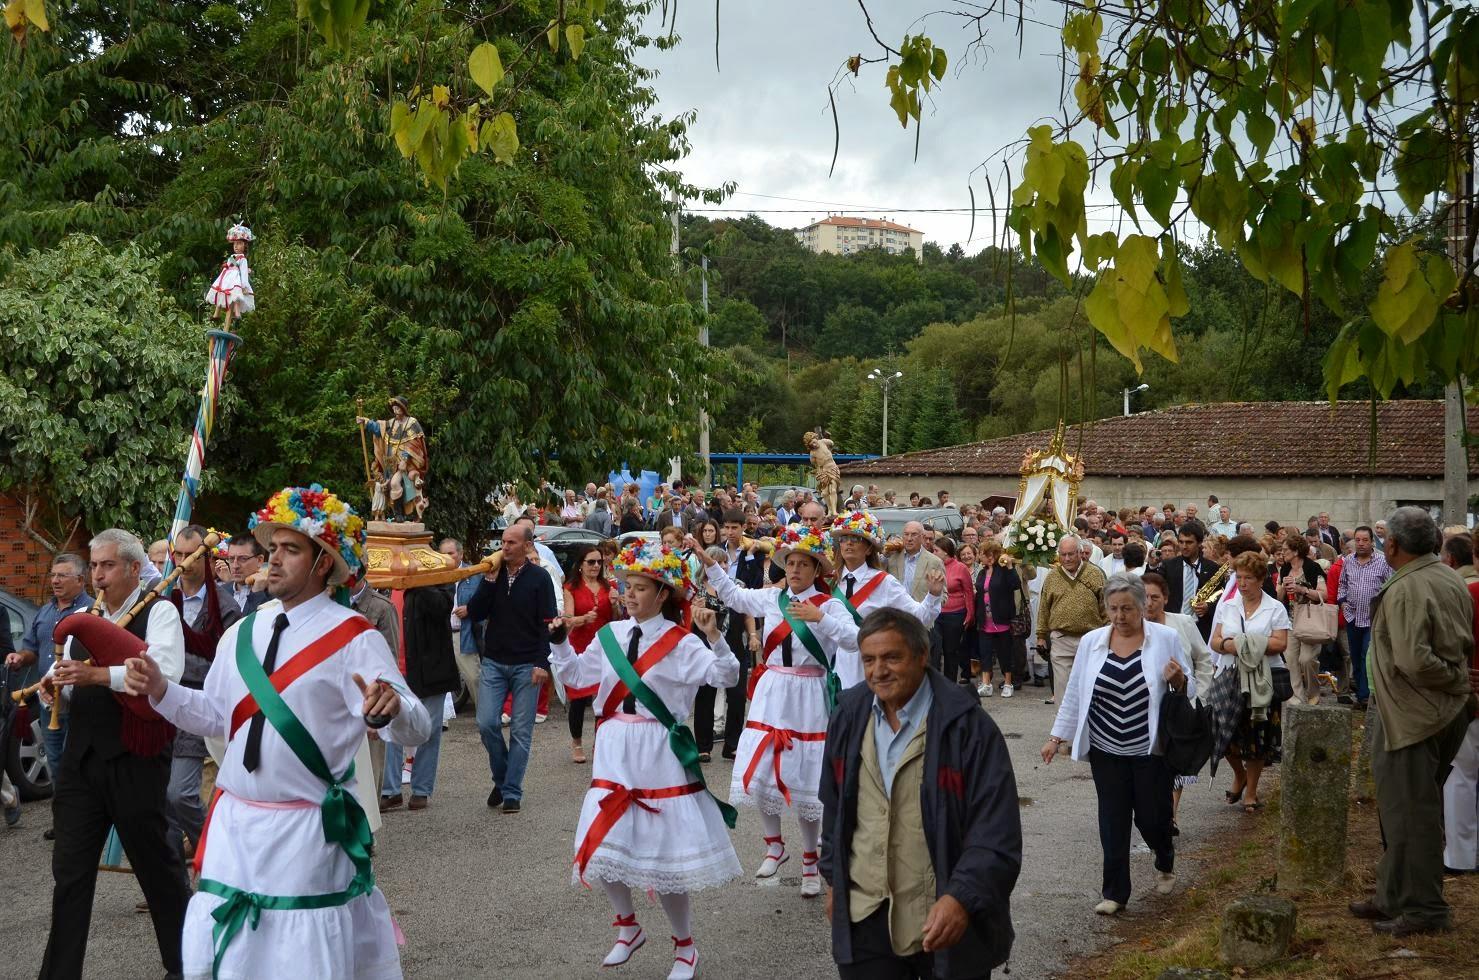 fiesta Virgen voyeur en Orense